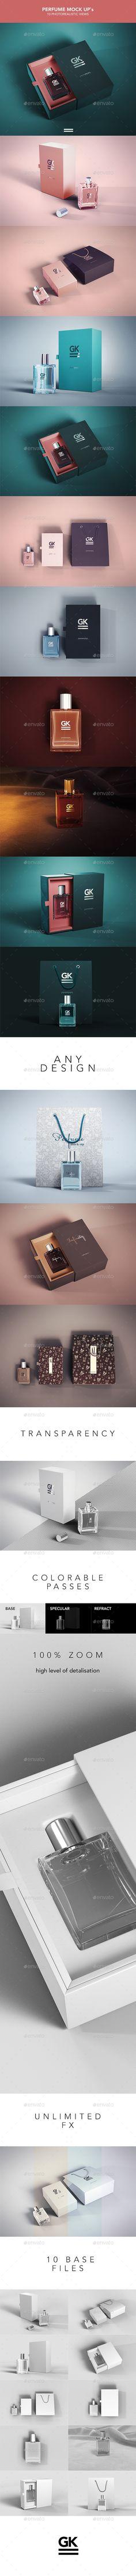 Perfume Mock-up. Download here: http://graphicriver.net/item/perfume-mockup/15591572?ref=ksioks